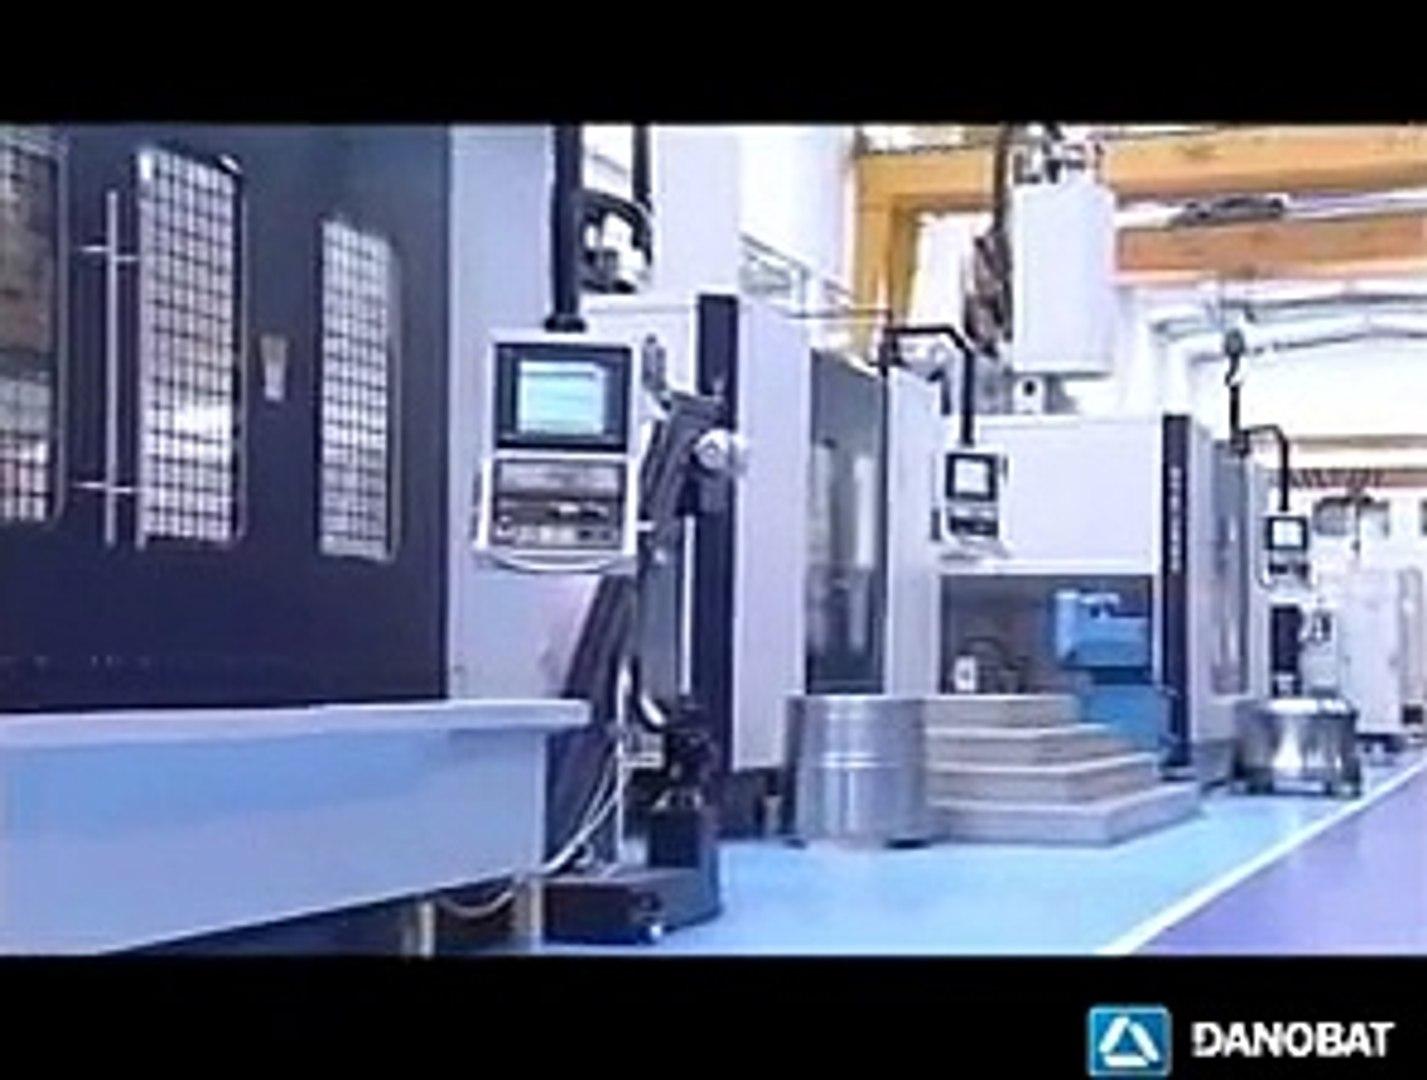 DANOBAT Turning technology